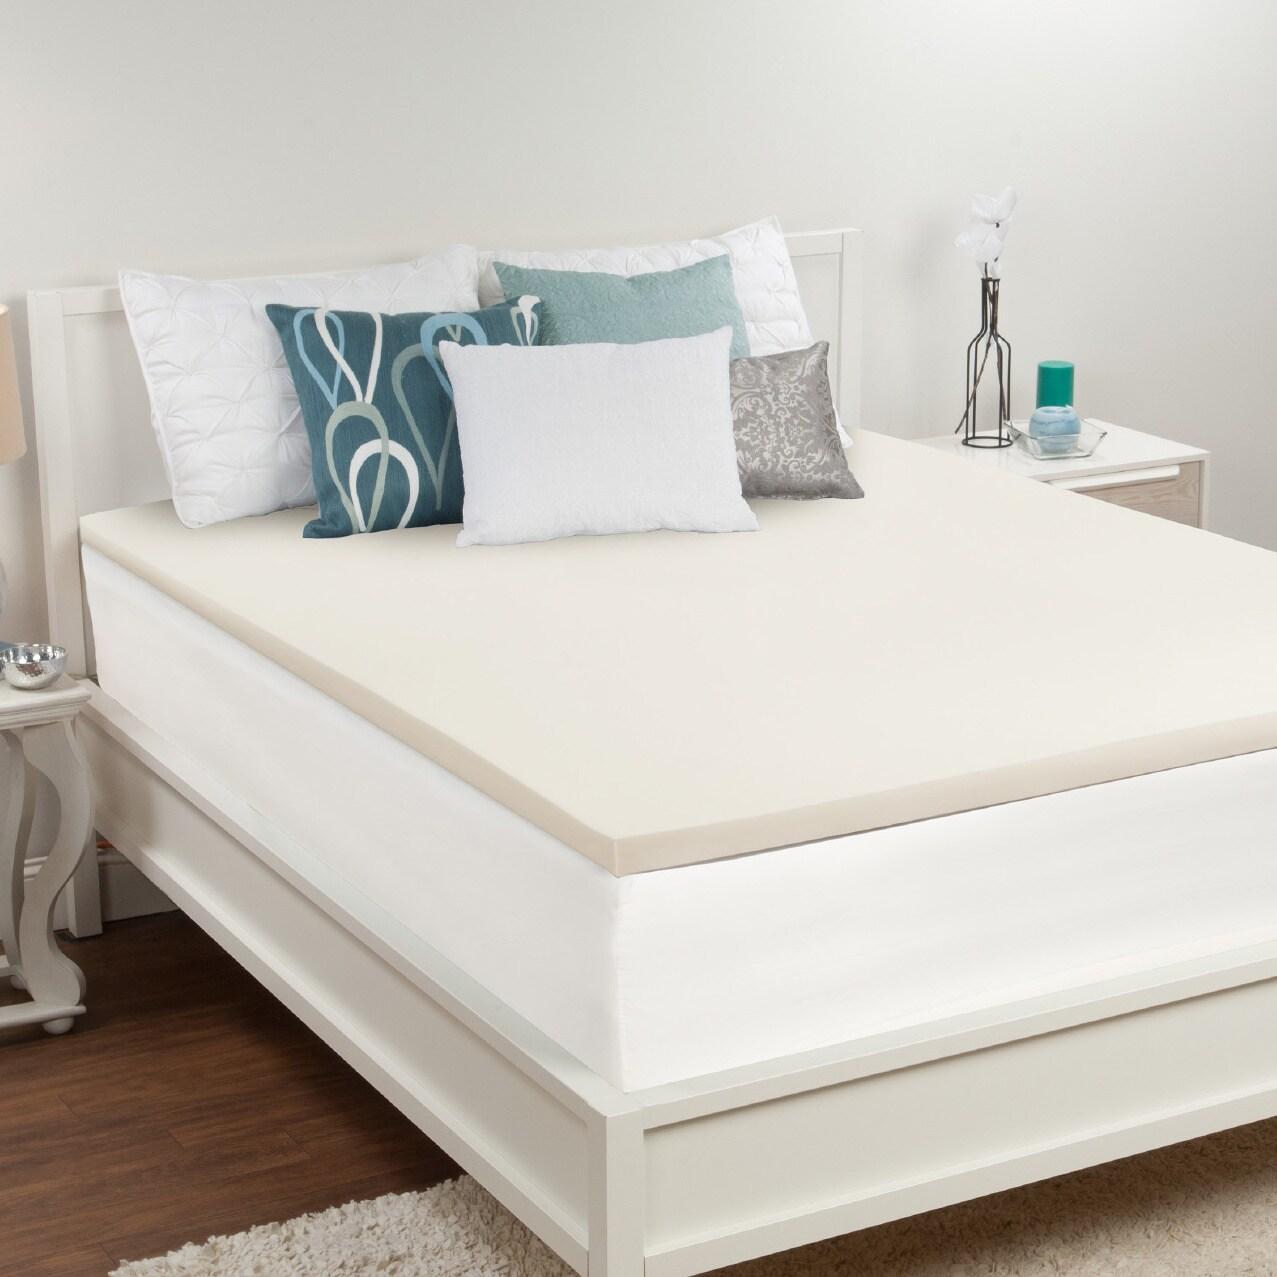 Sealy Premium 1.5-inch Memory Foam Mattress Topper (King)...